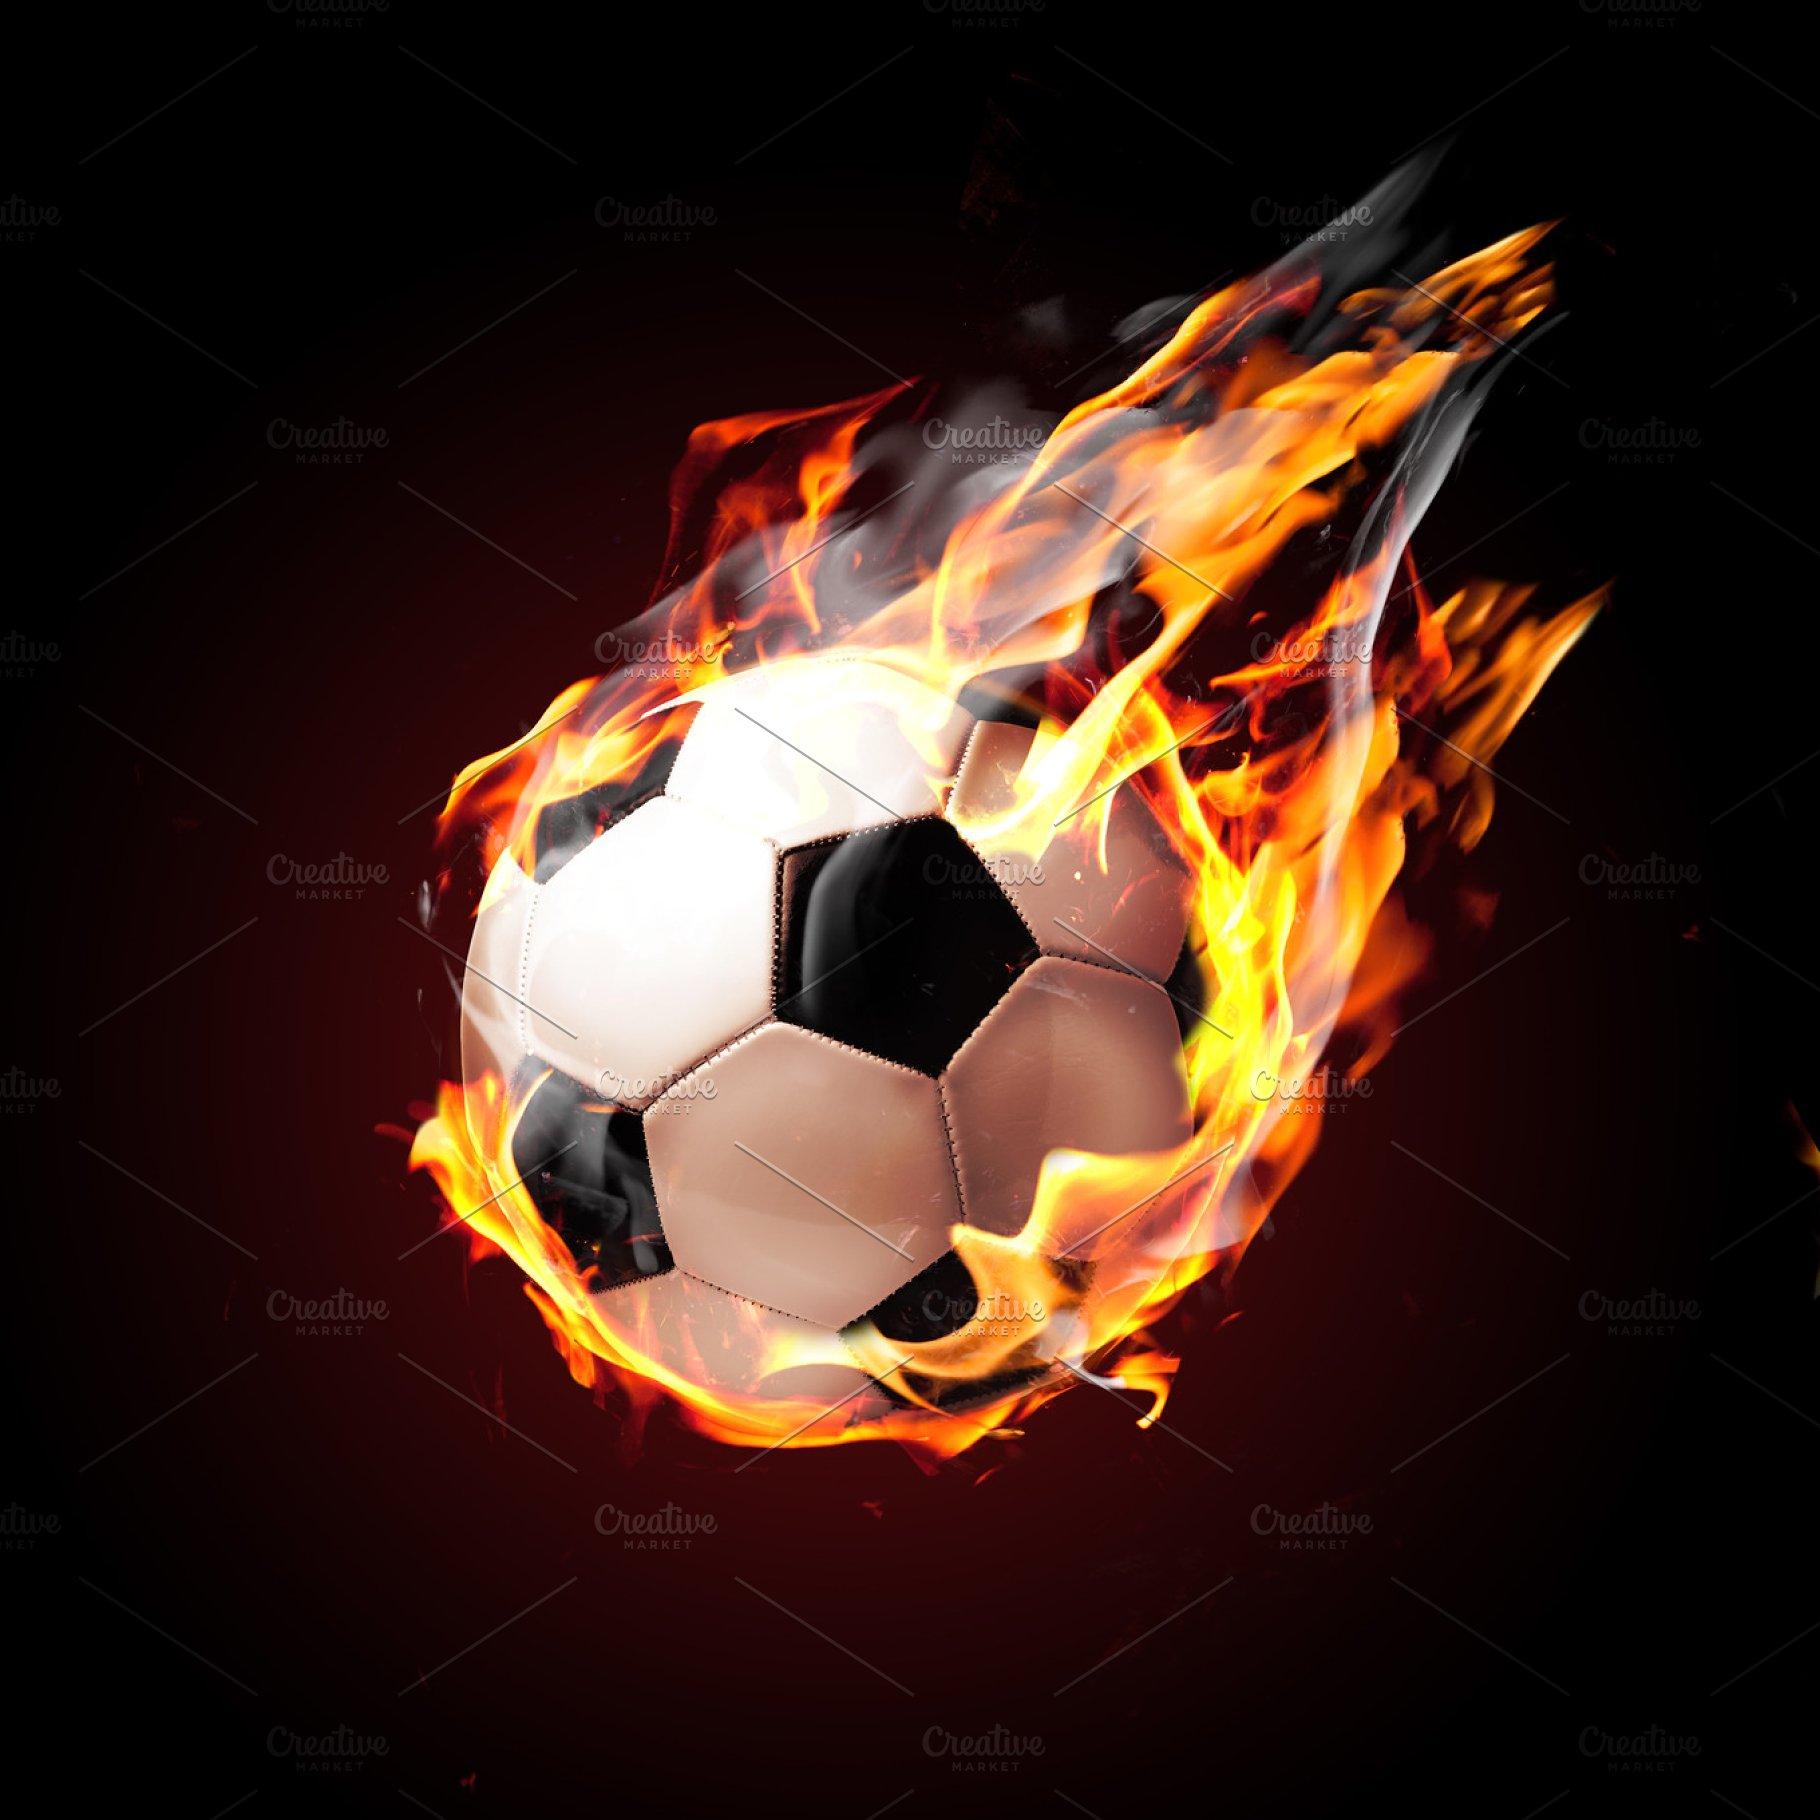 Soccer ball on fire | High-Quality Stock Photos ~ Creative Market